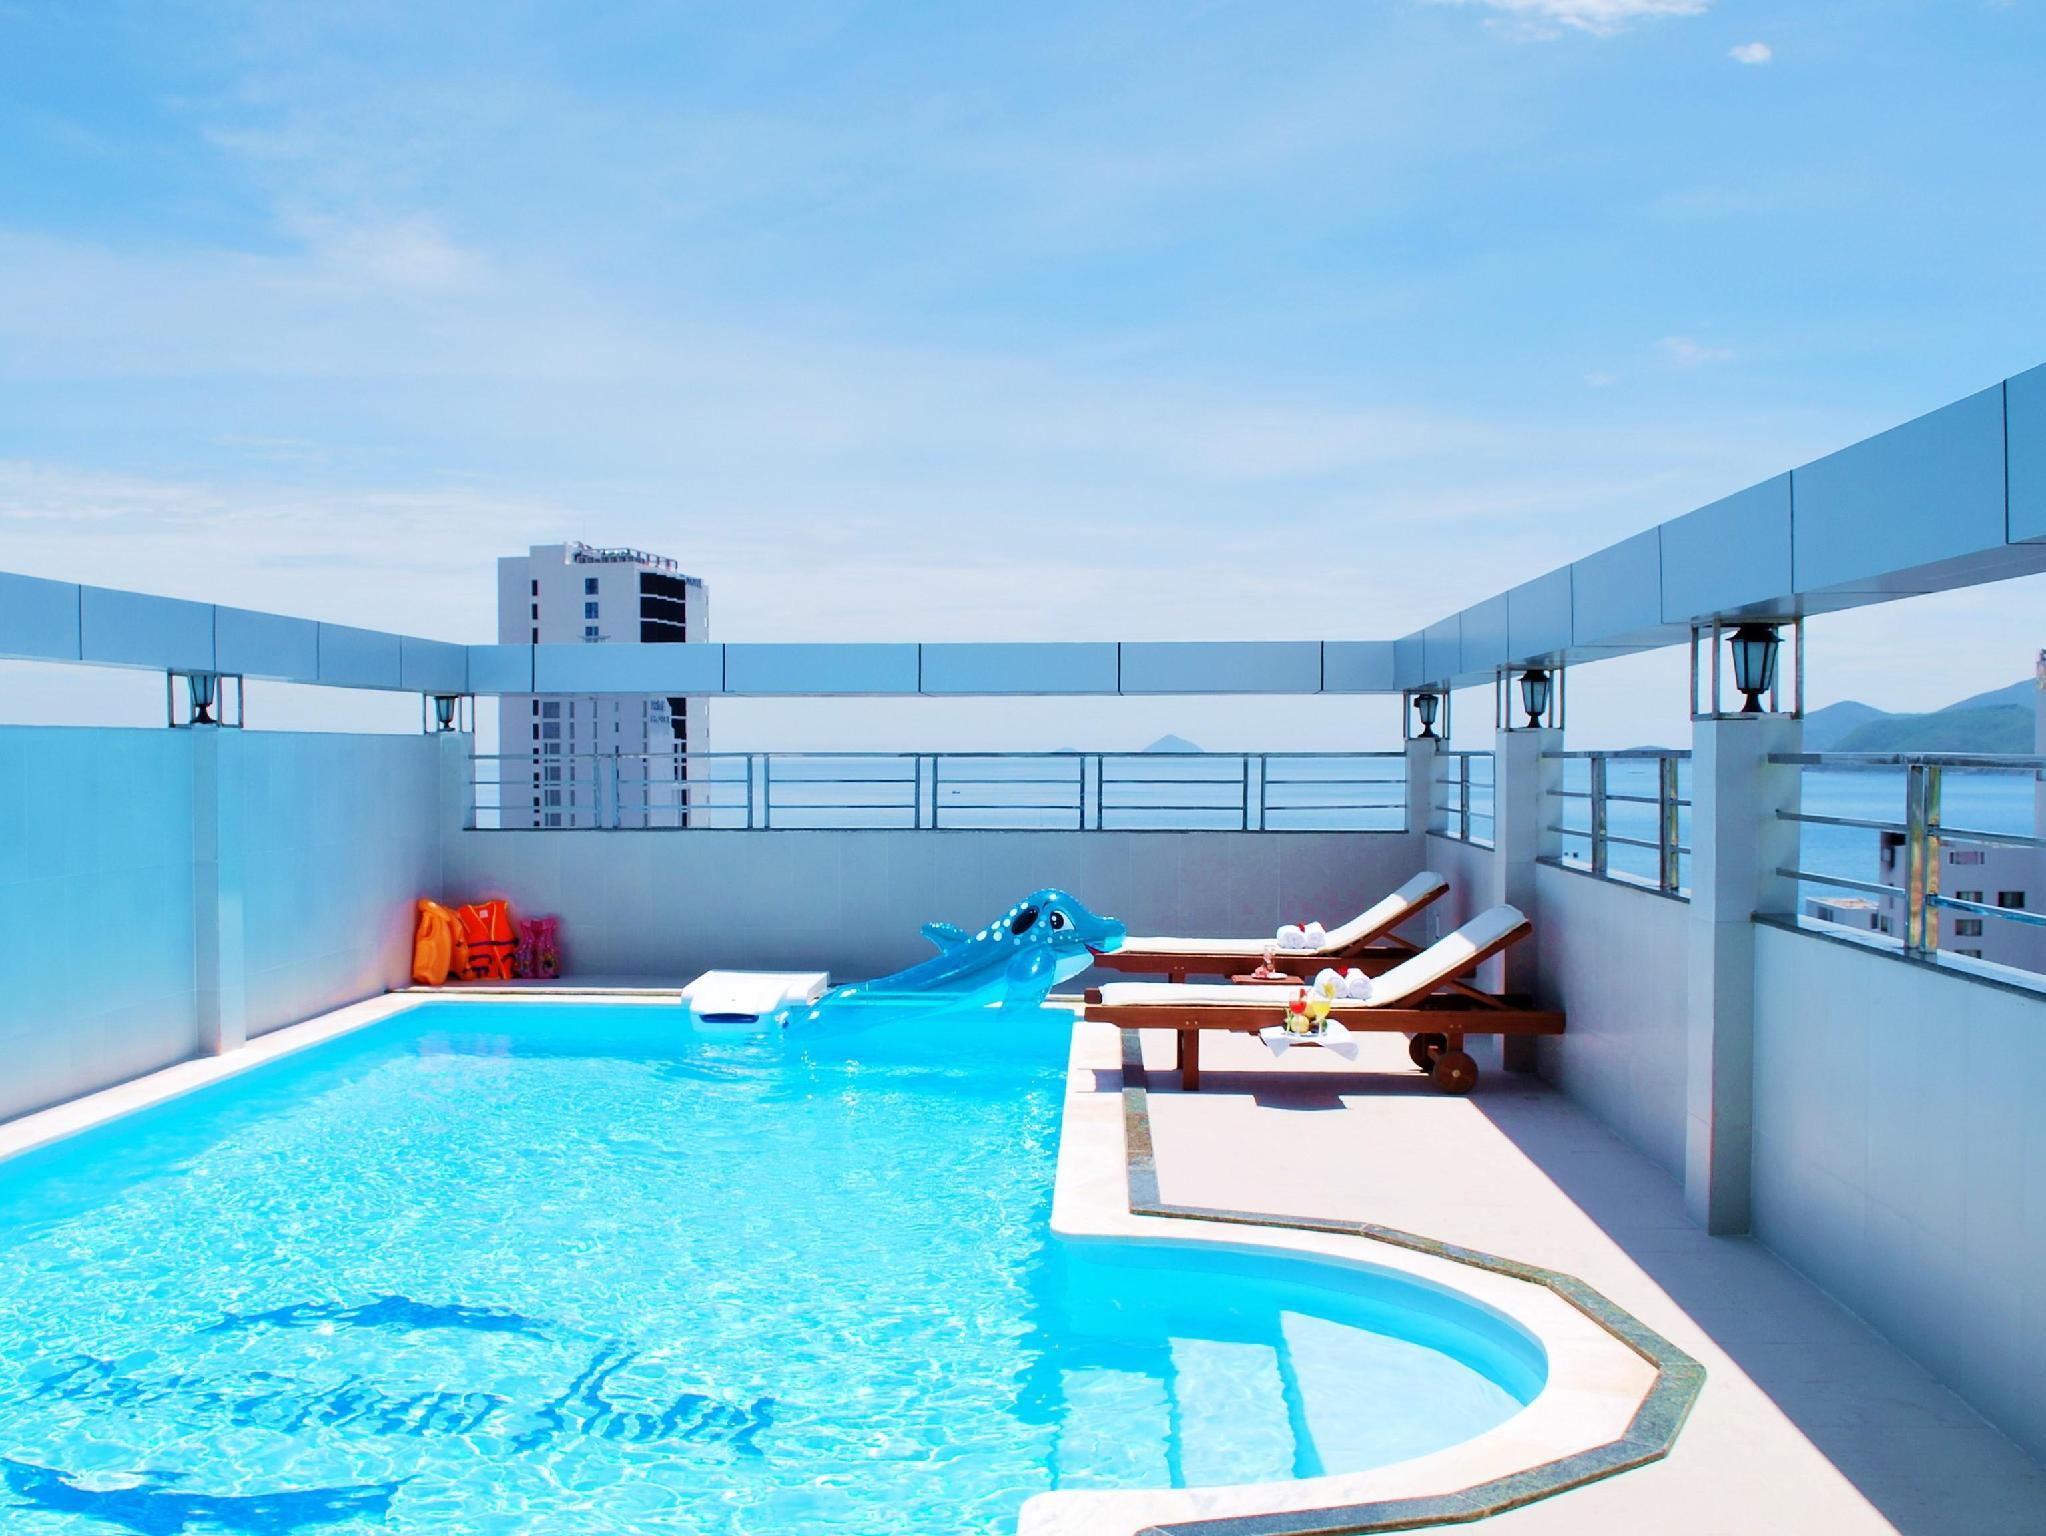 Barcelona Hotel Nha Trang